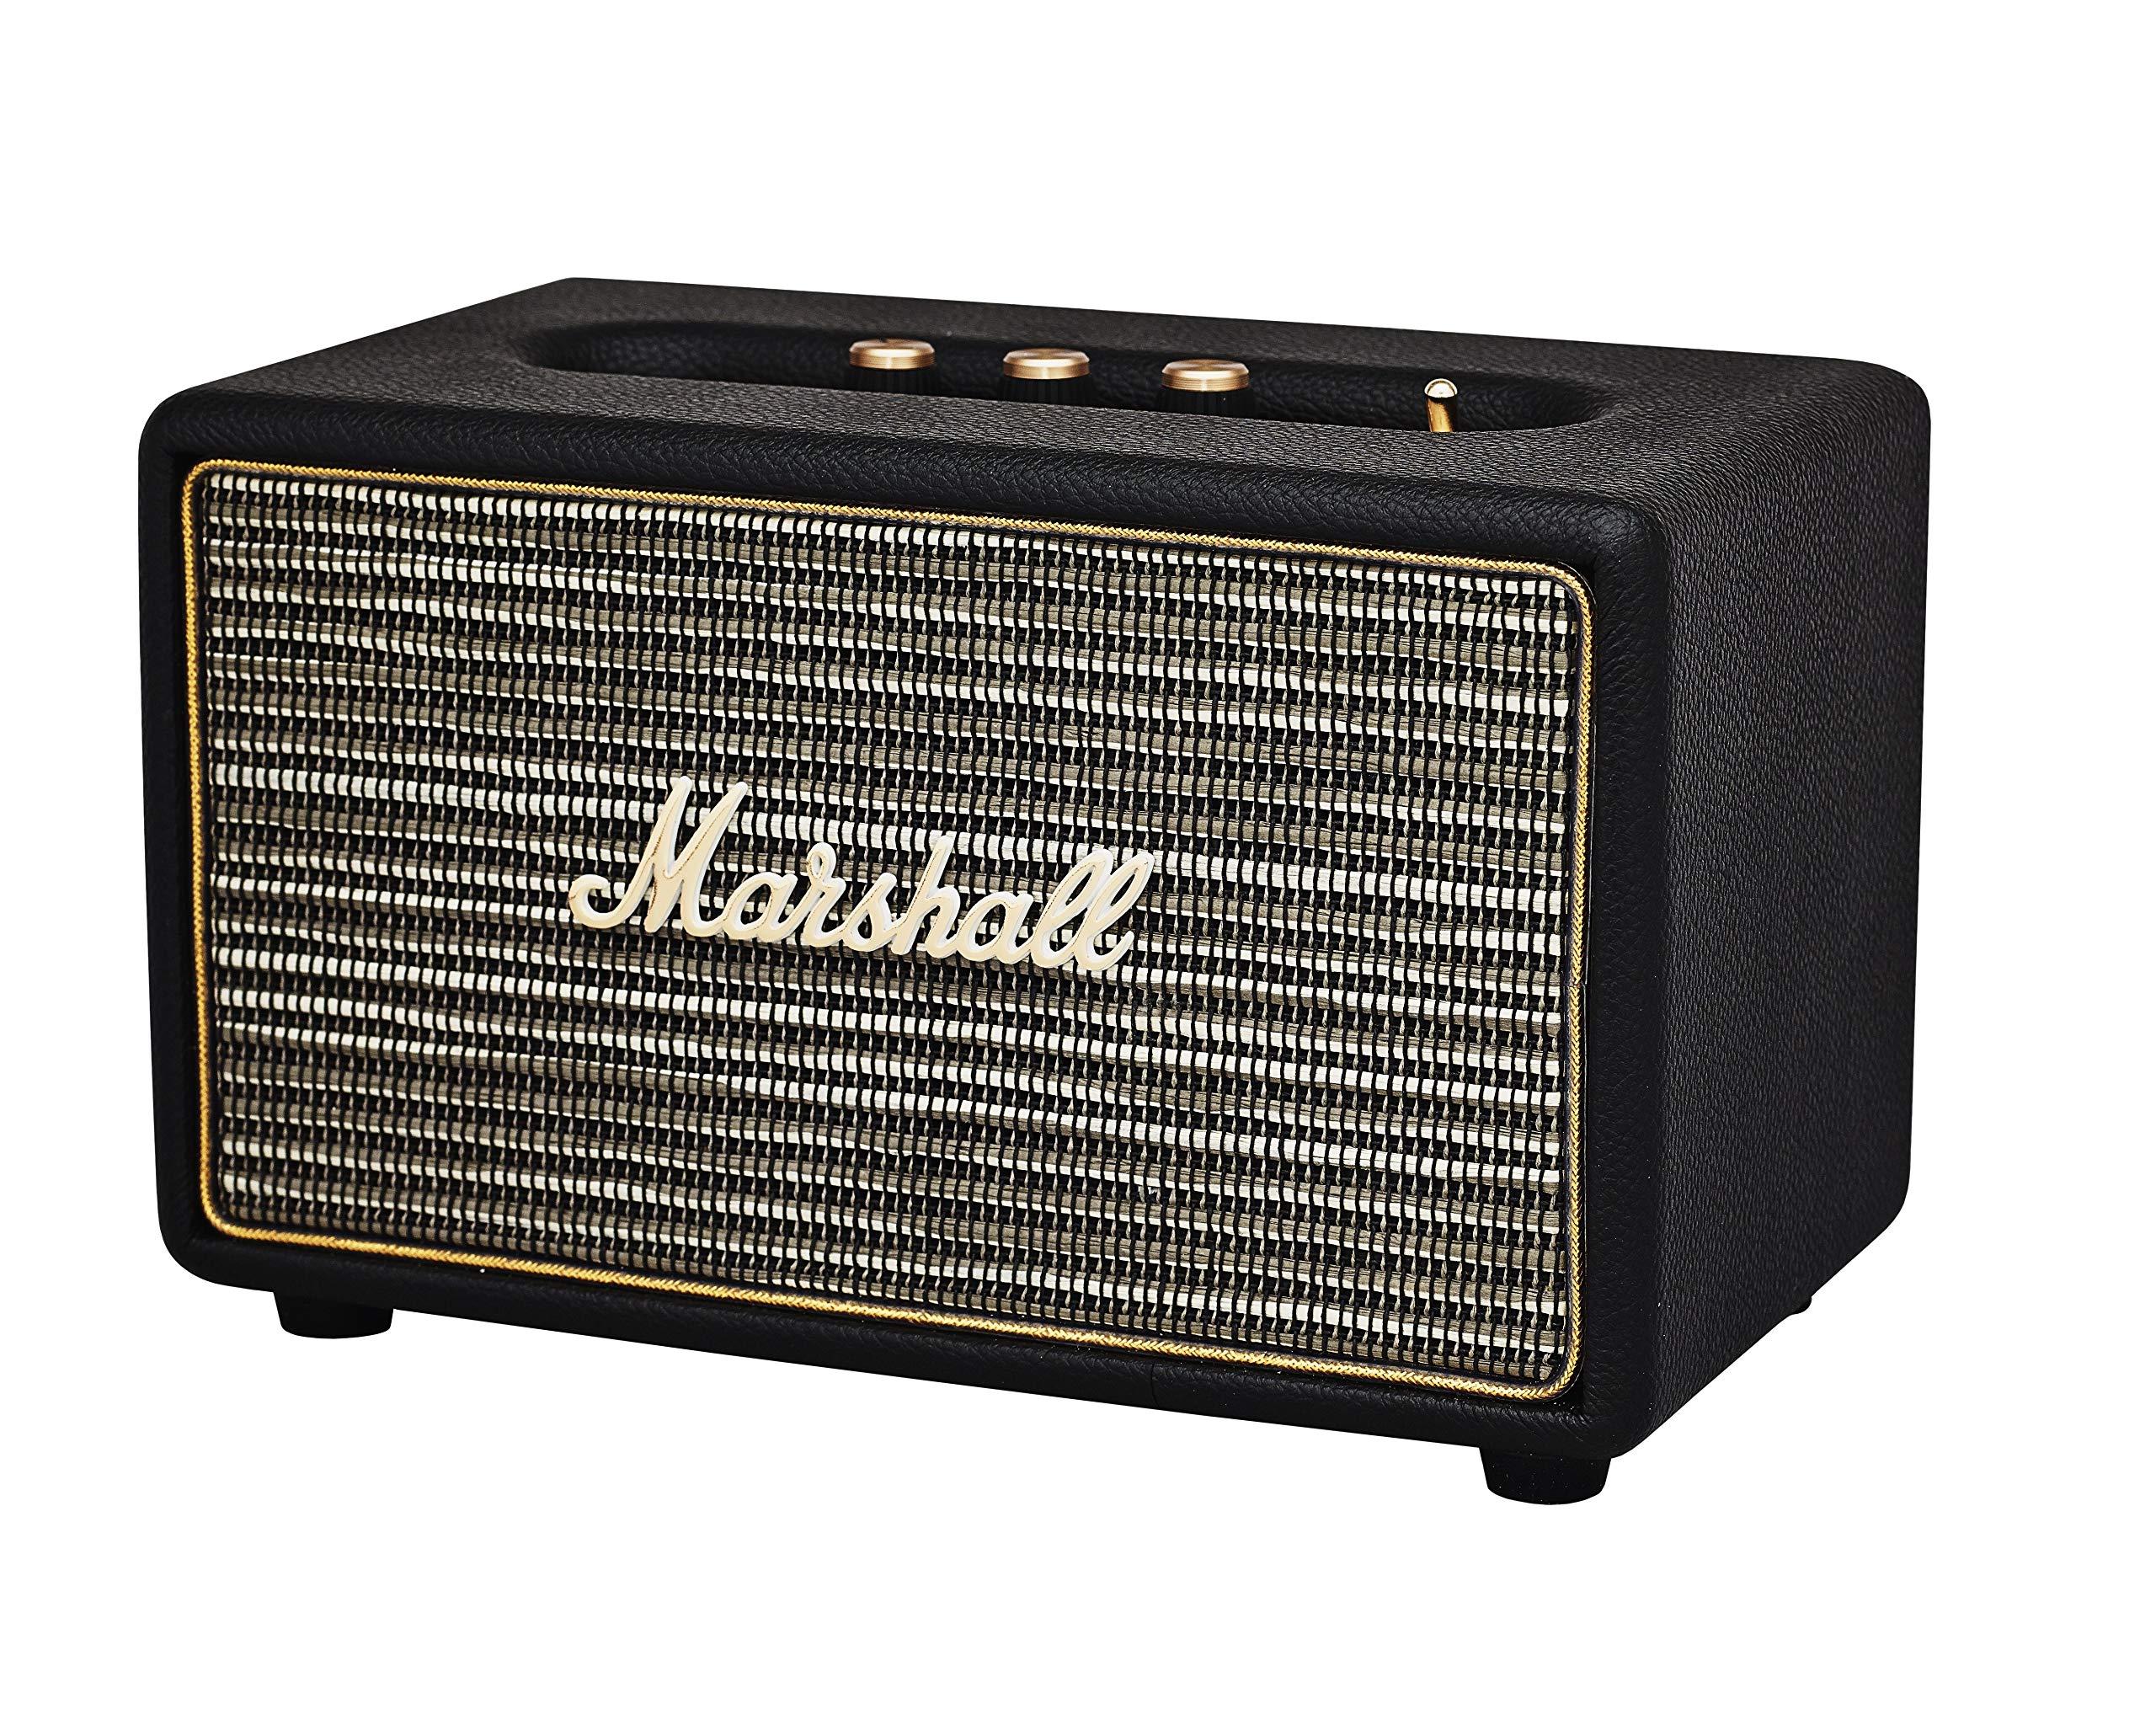 Marshall 04091802 Acton Wireless Bluetooth Speaker Black by Marshall (Image #5)